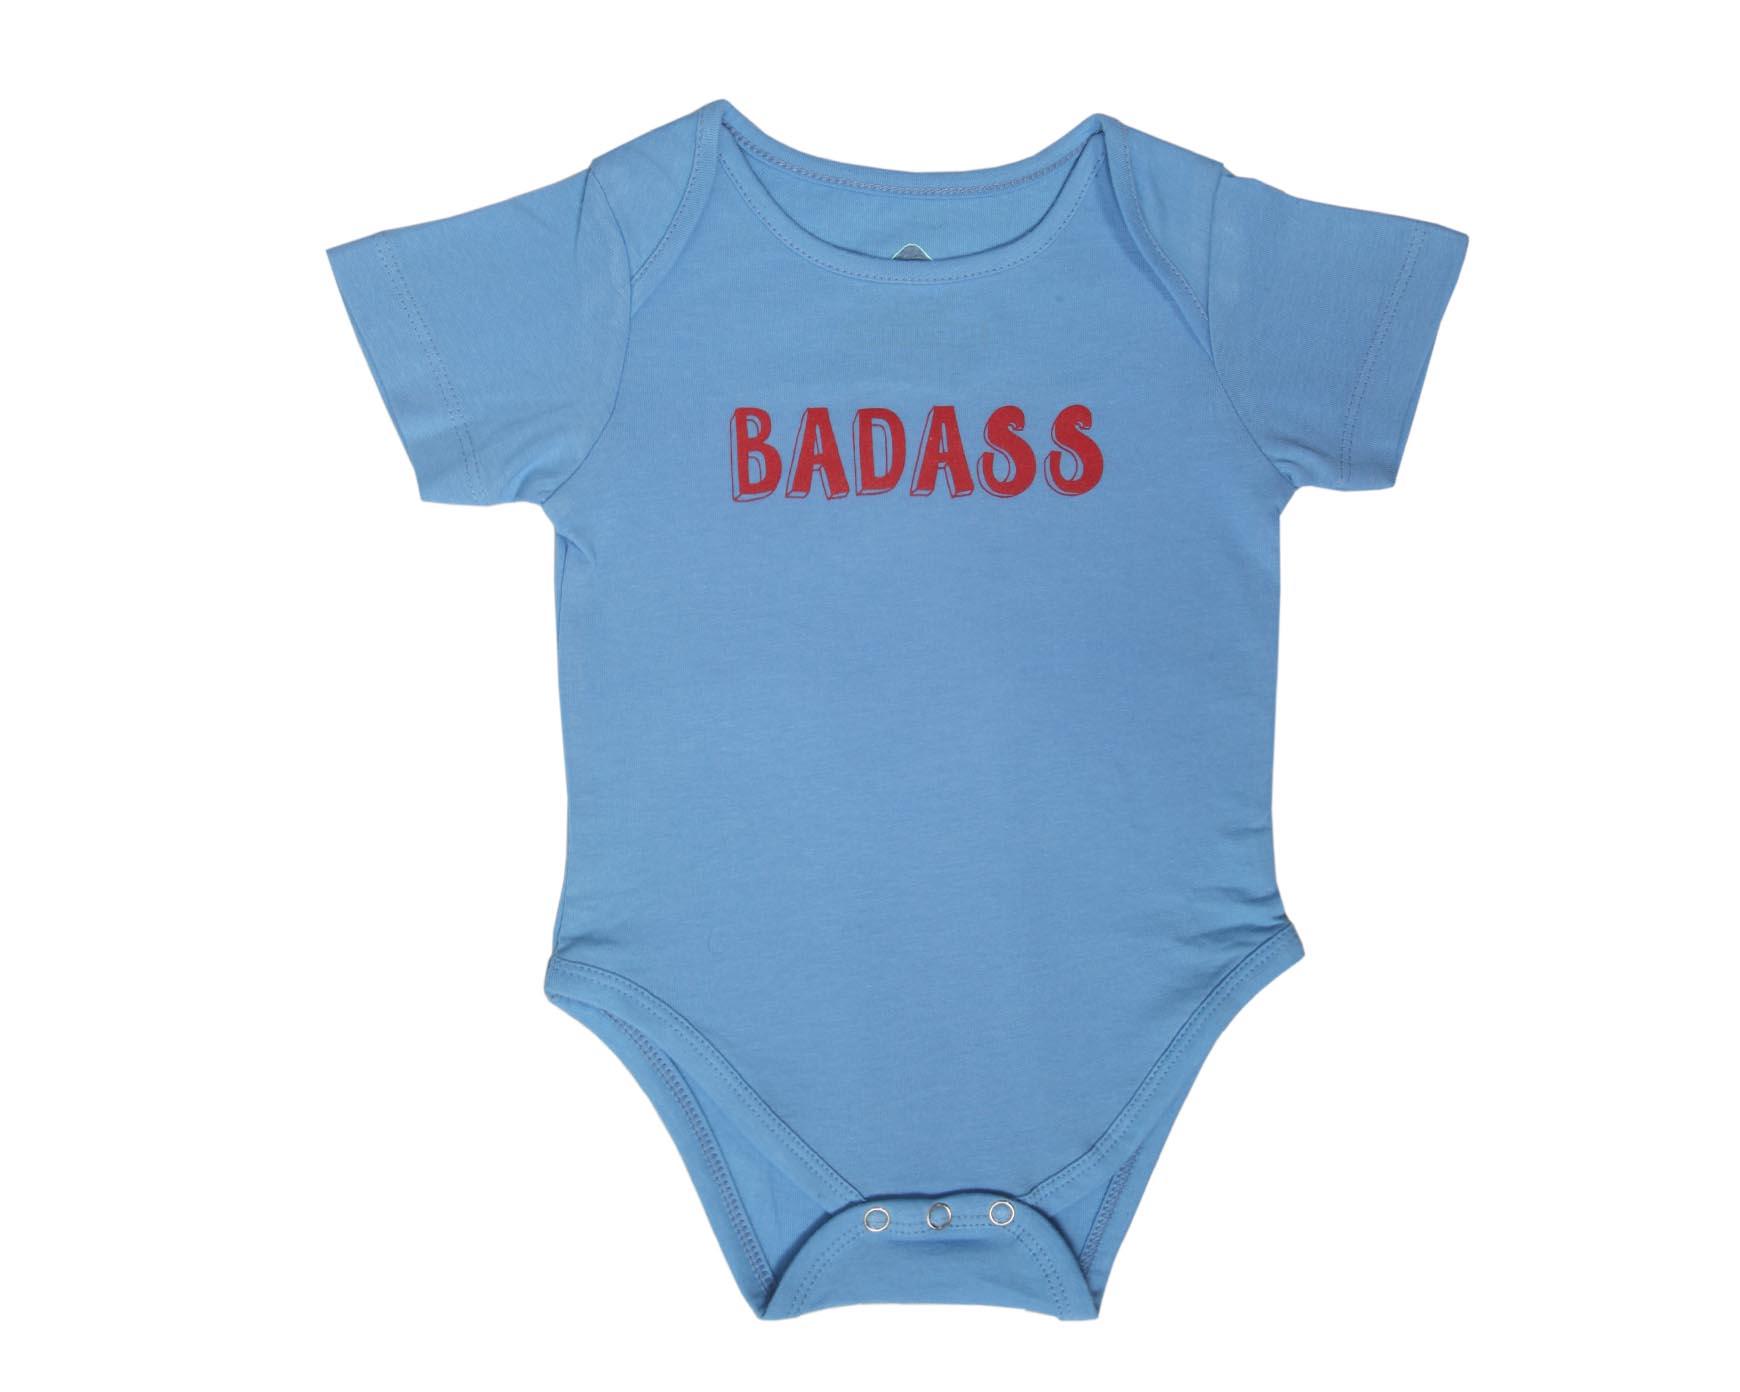 BADASS